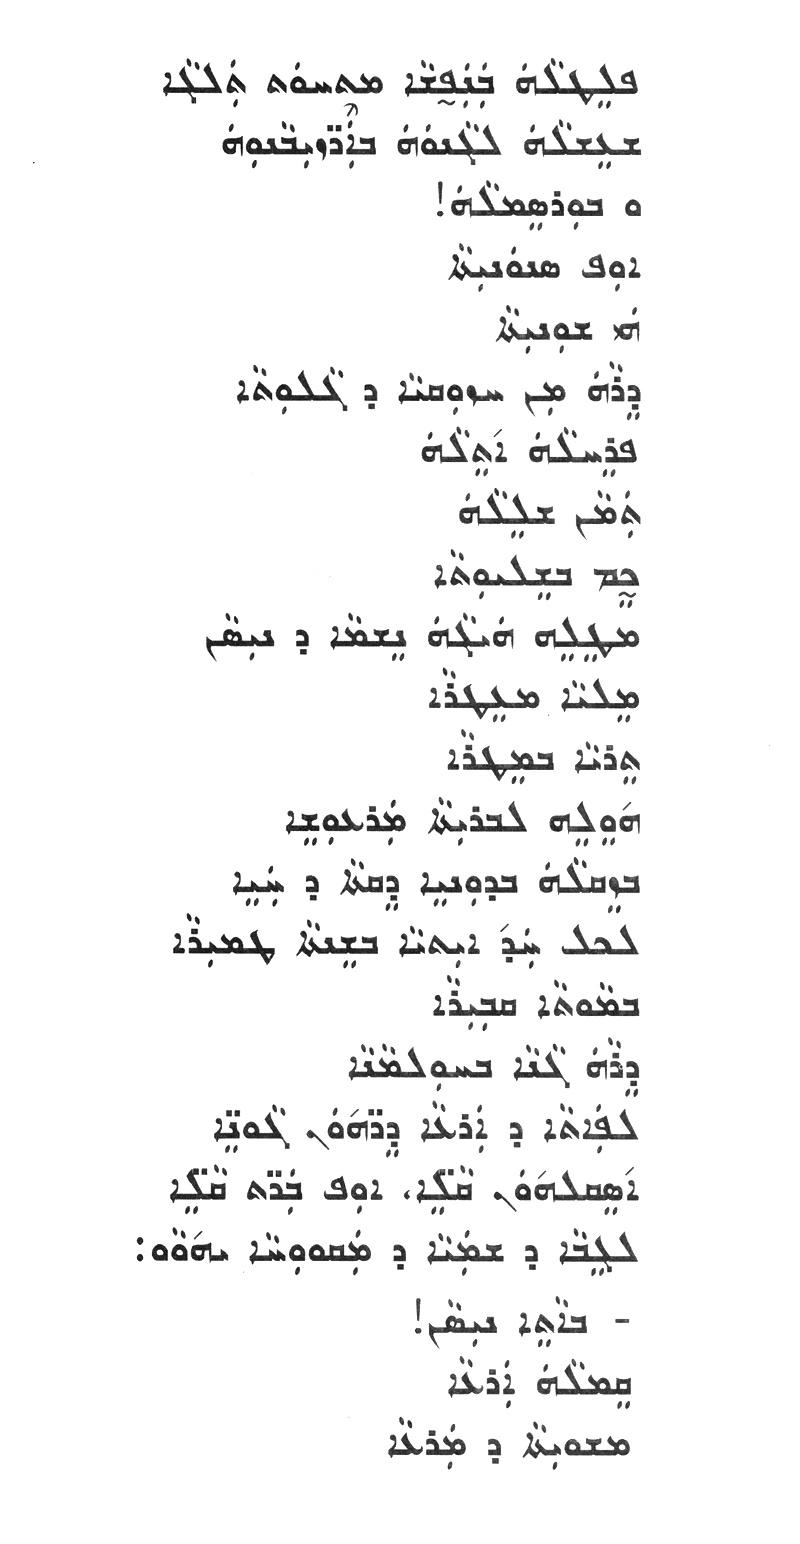 shamiram-3